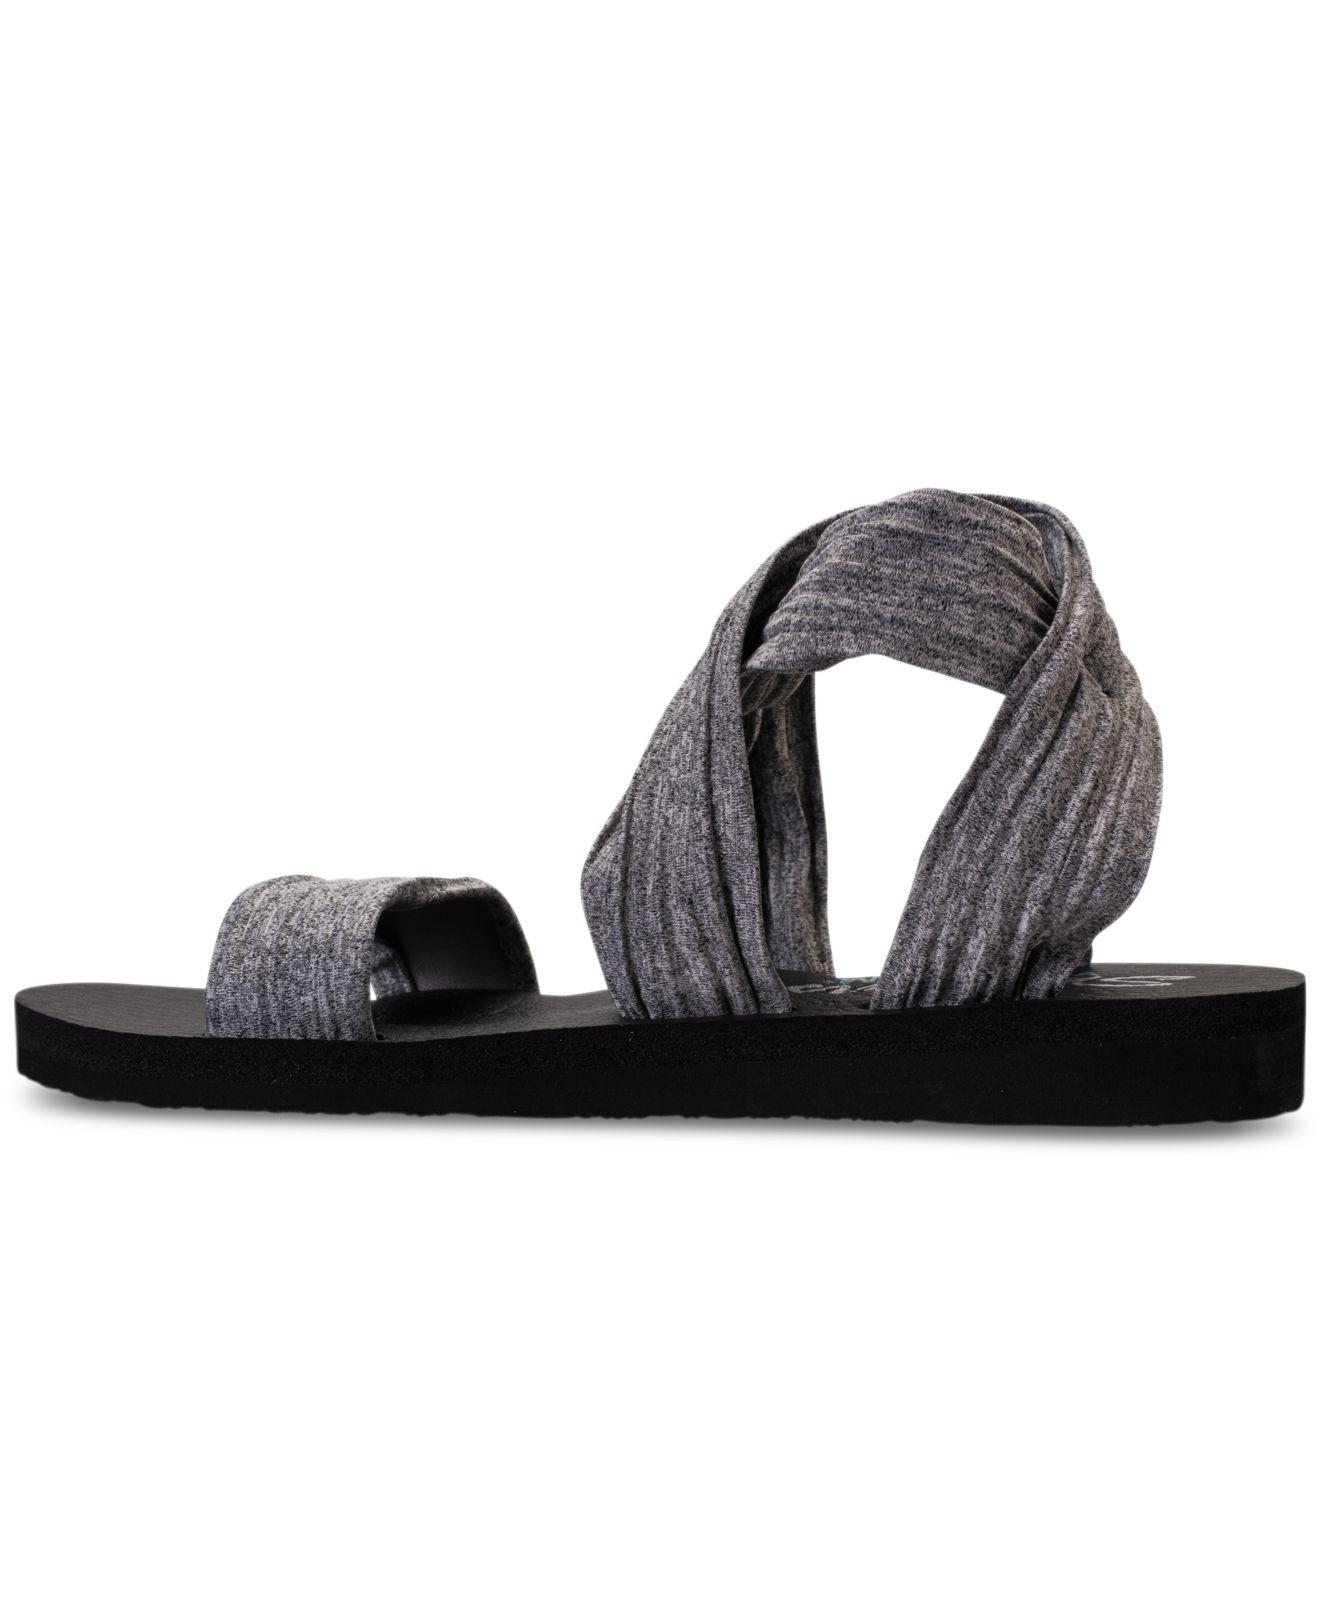 0c10125918b4 Lyst - Skechers Cali Meditation - Still Sky Sandals From Finish Line ...